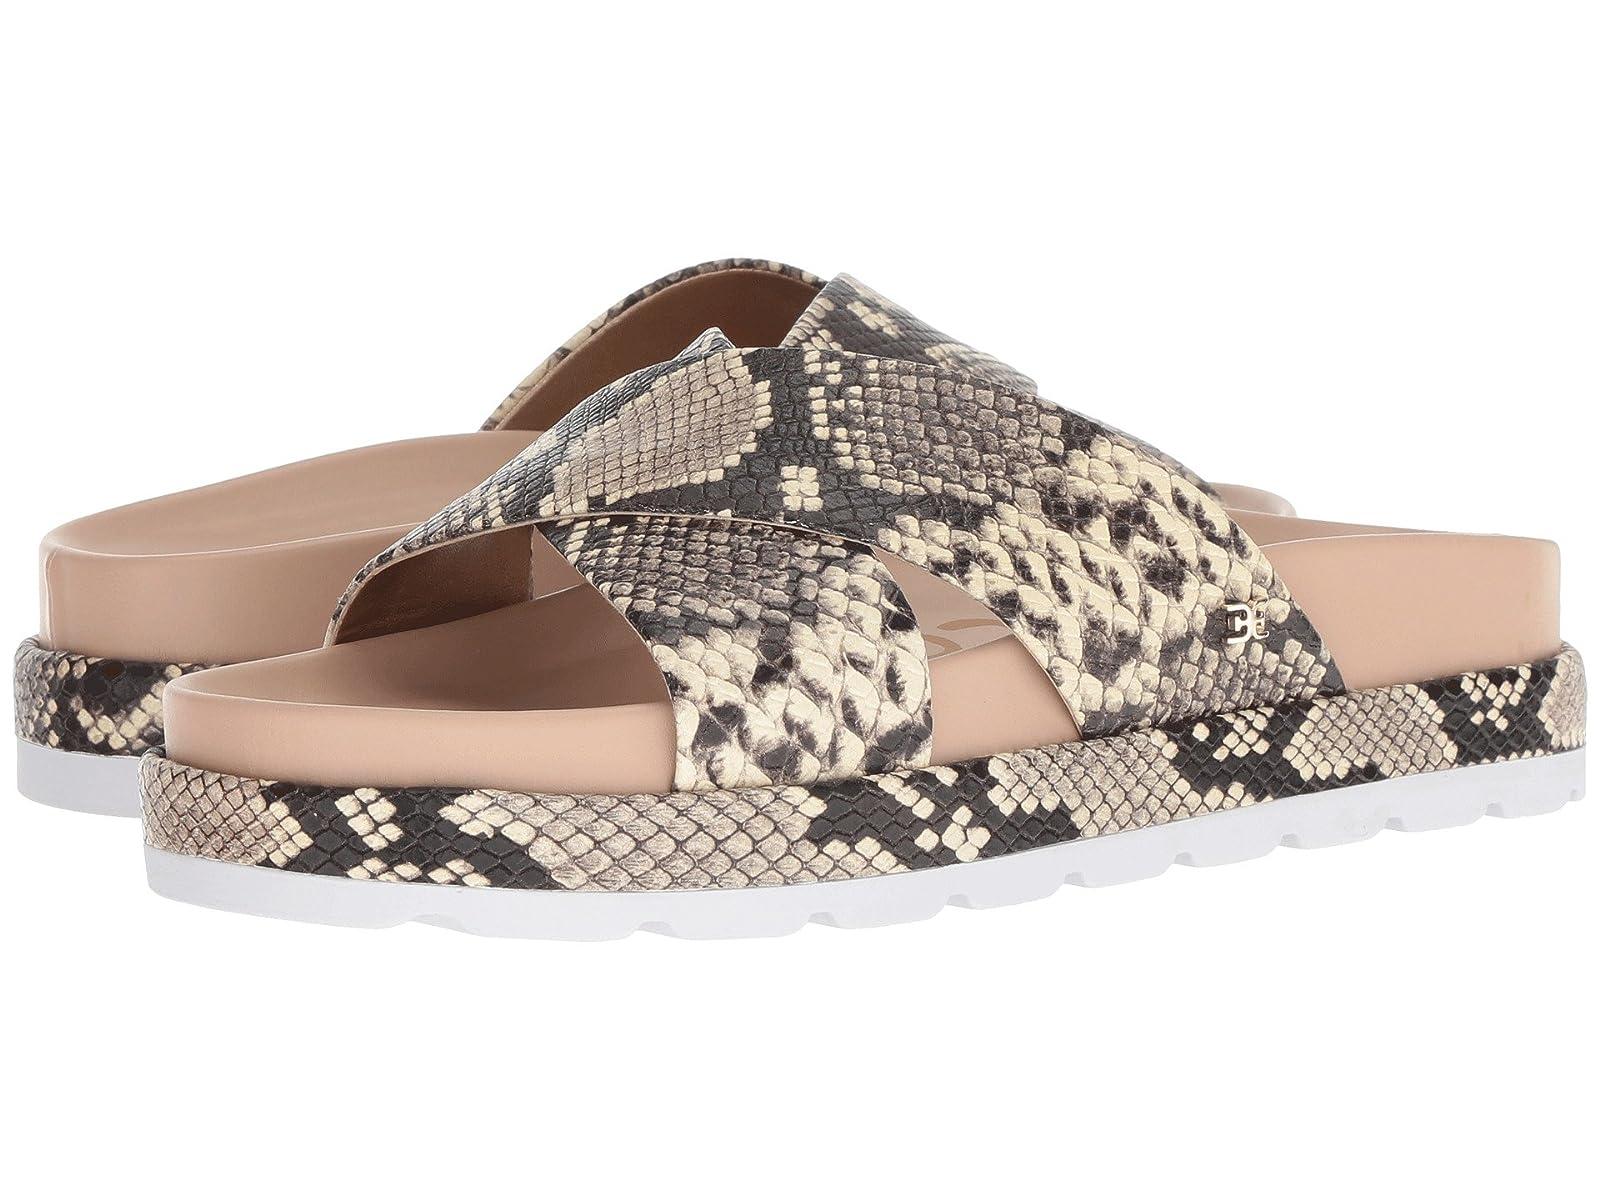 Sam Edelman SadiaCheap and distinctive eye-catching shoes